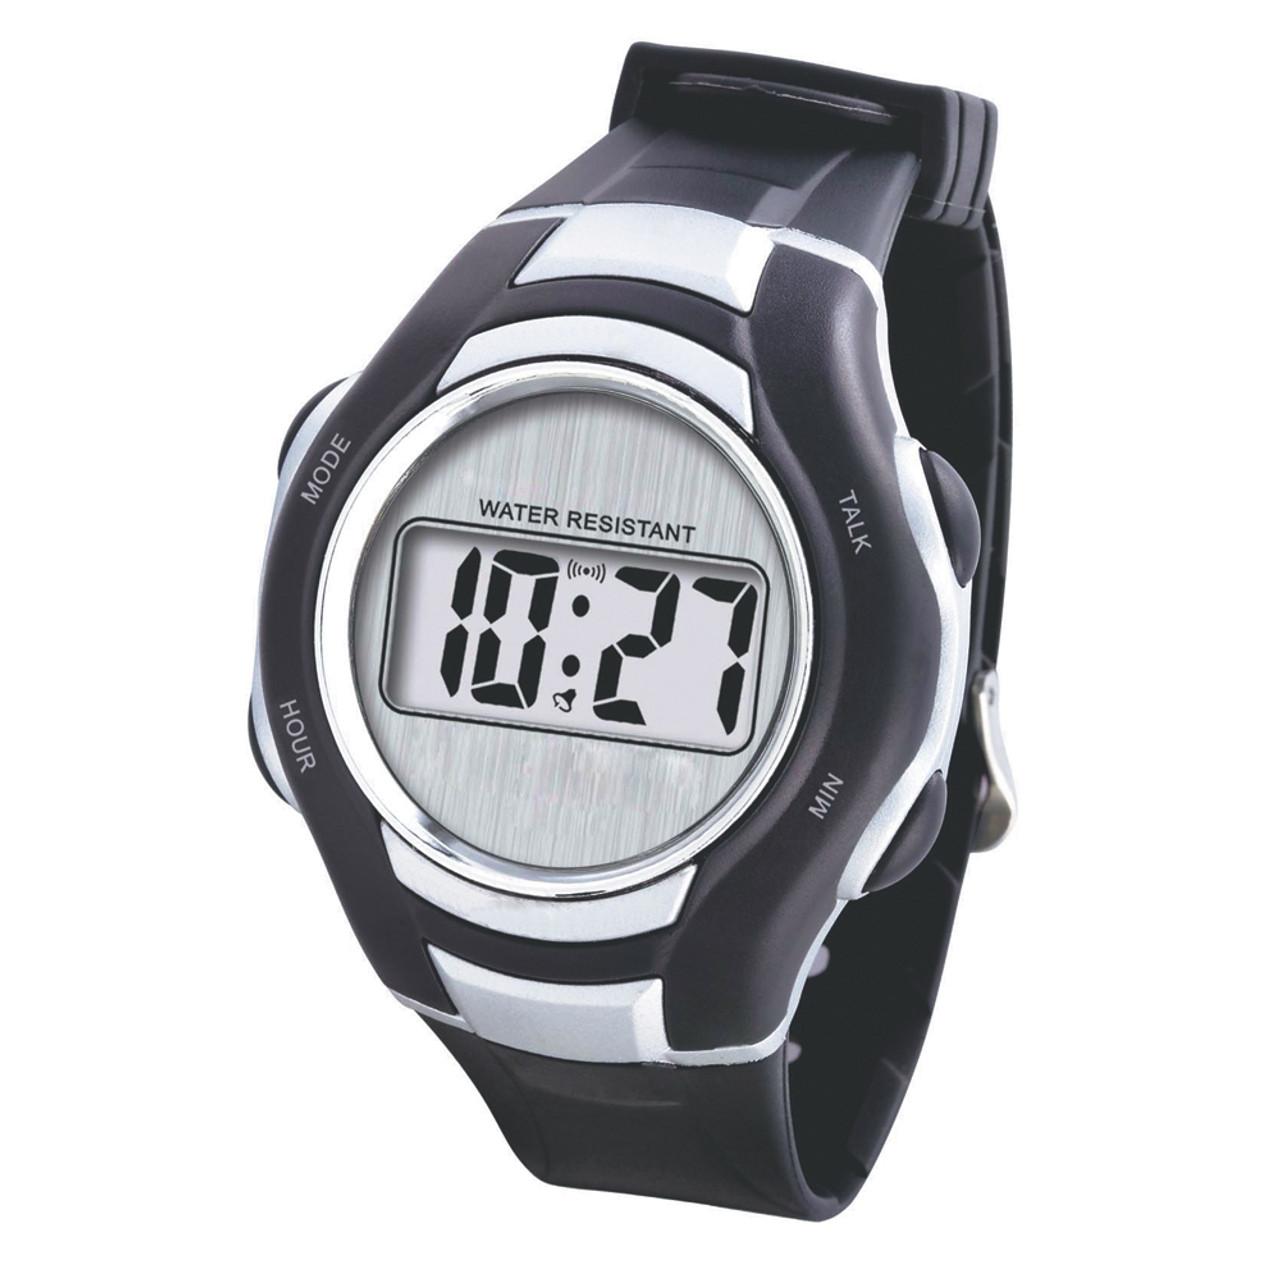 Talking Sport Watch - Silver Trim - Water Resistant